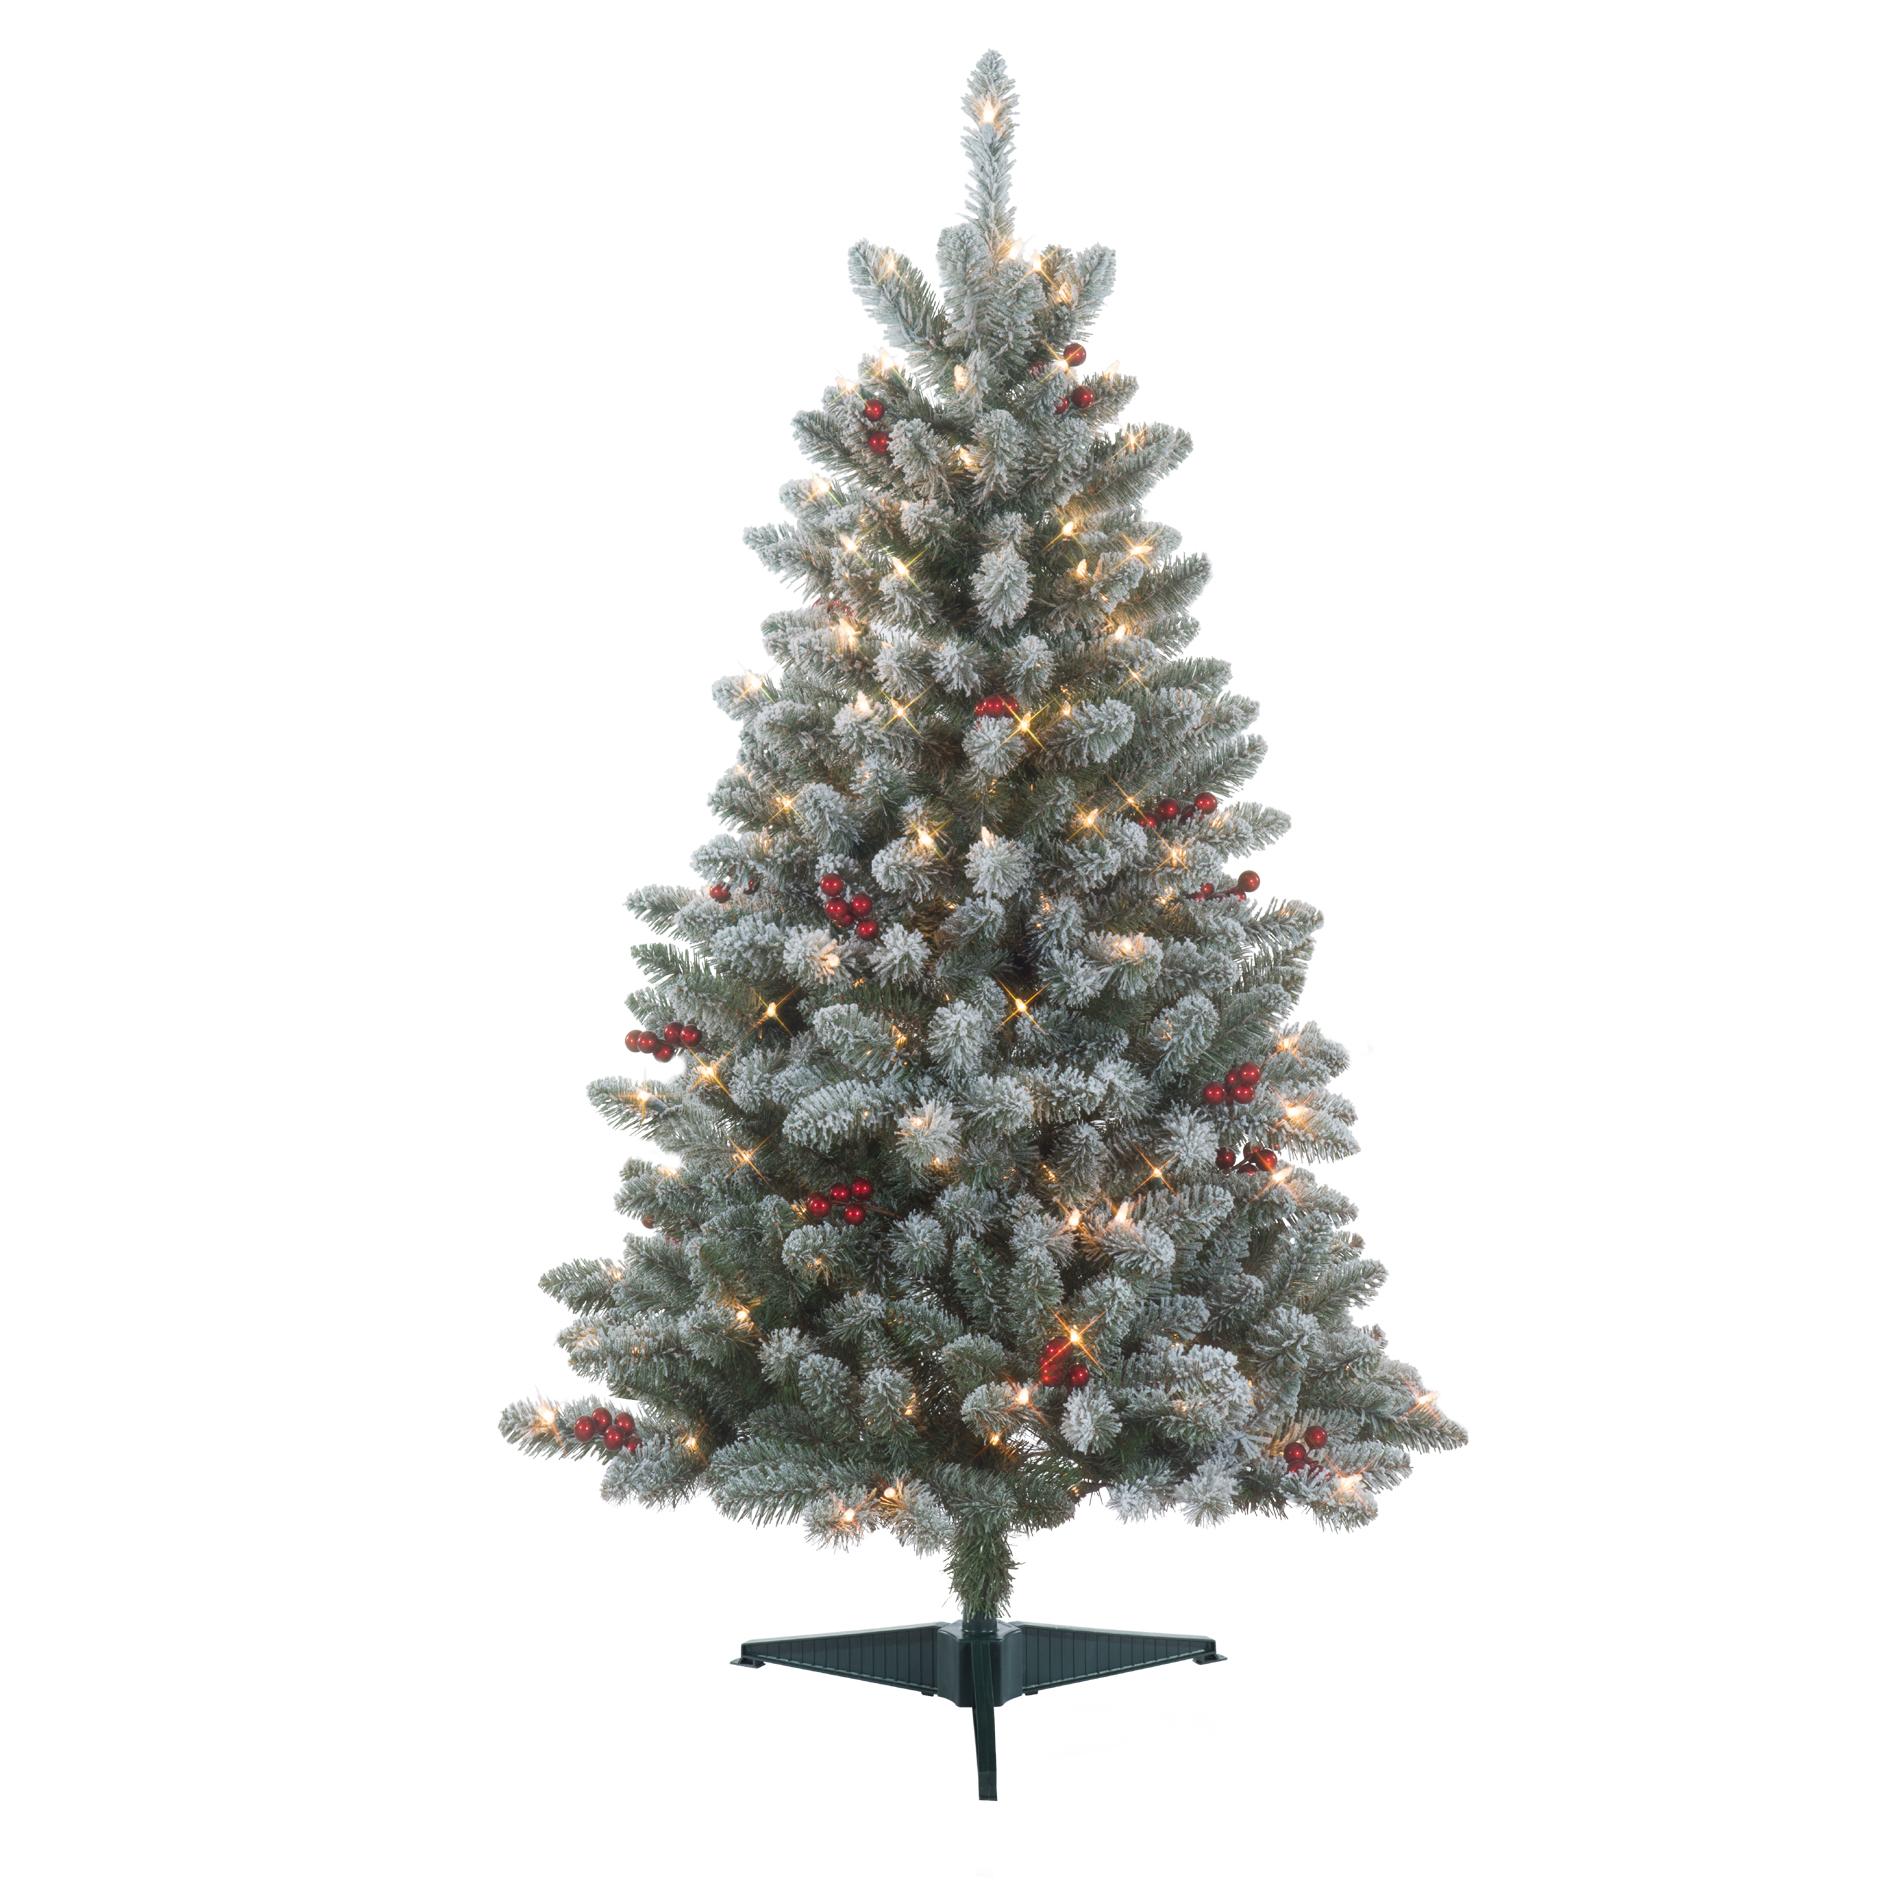 Christmas Tree Kmart